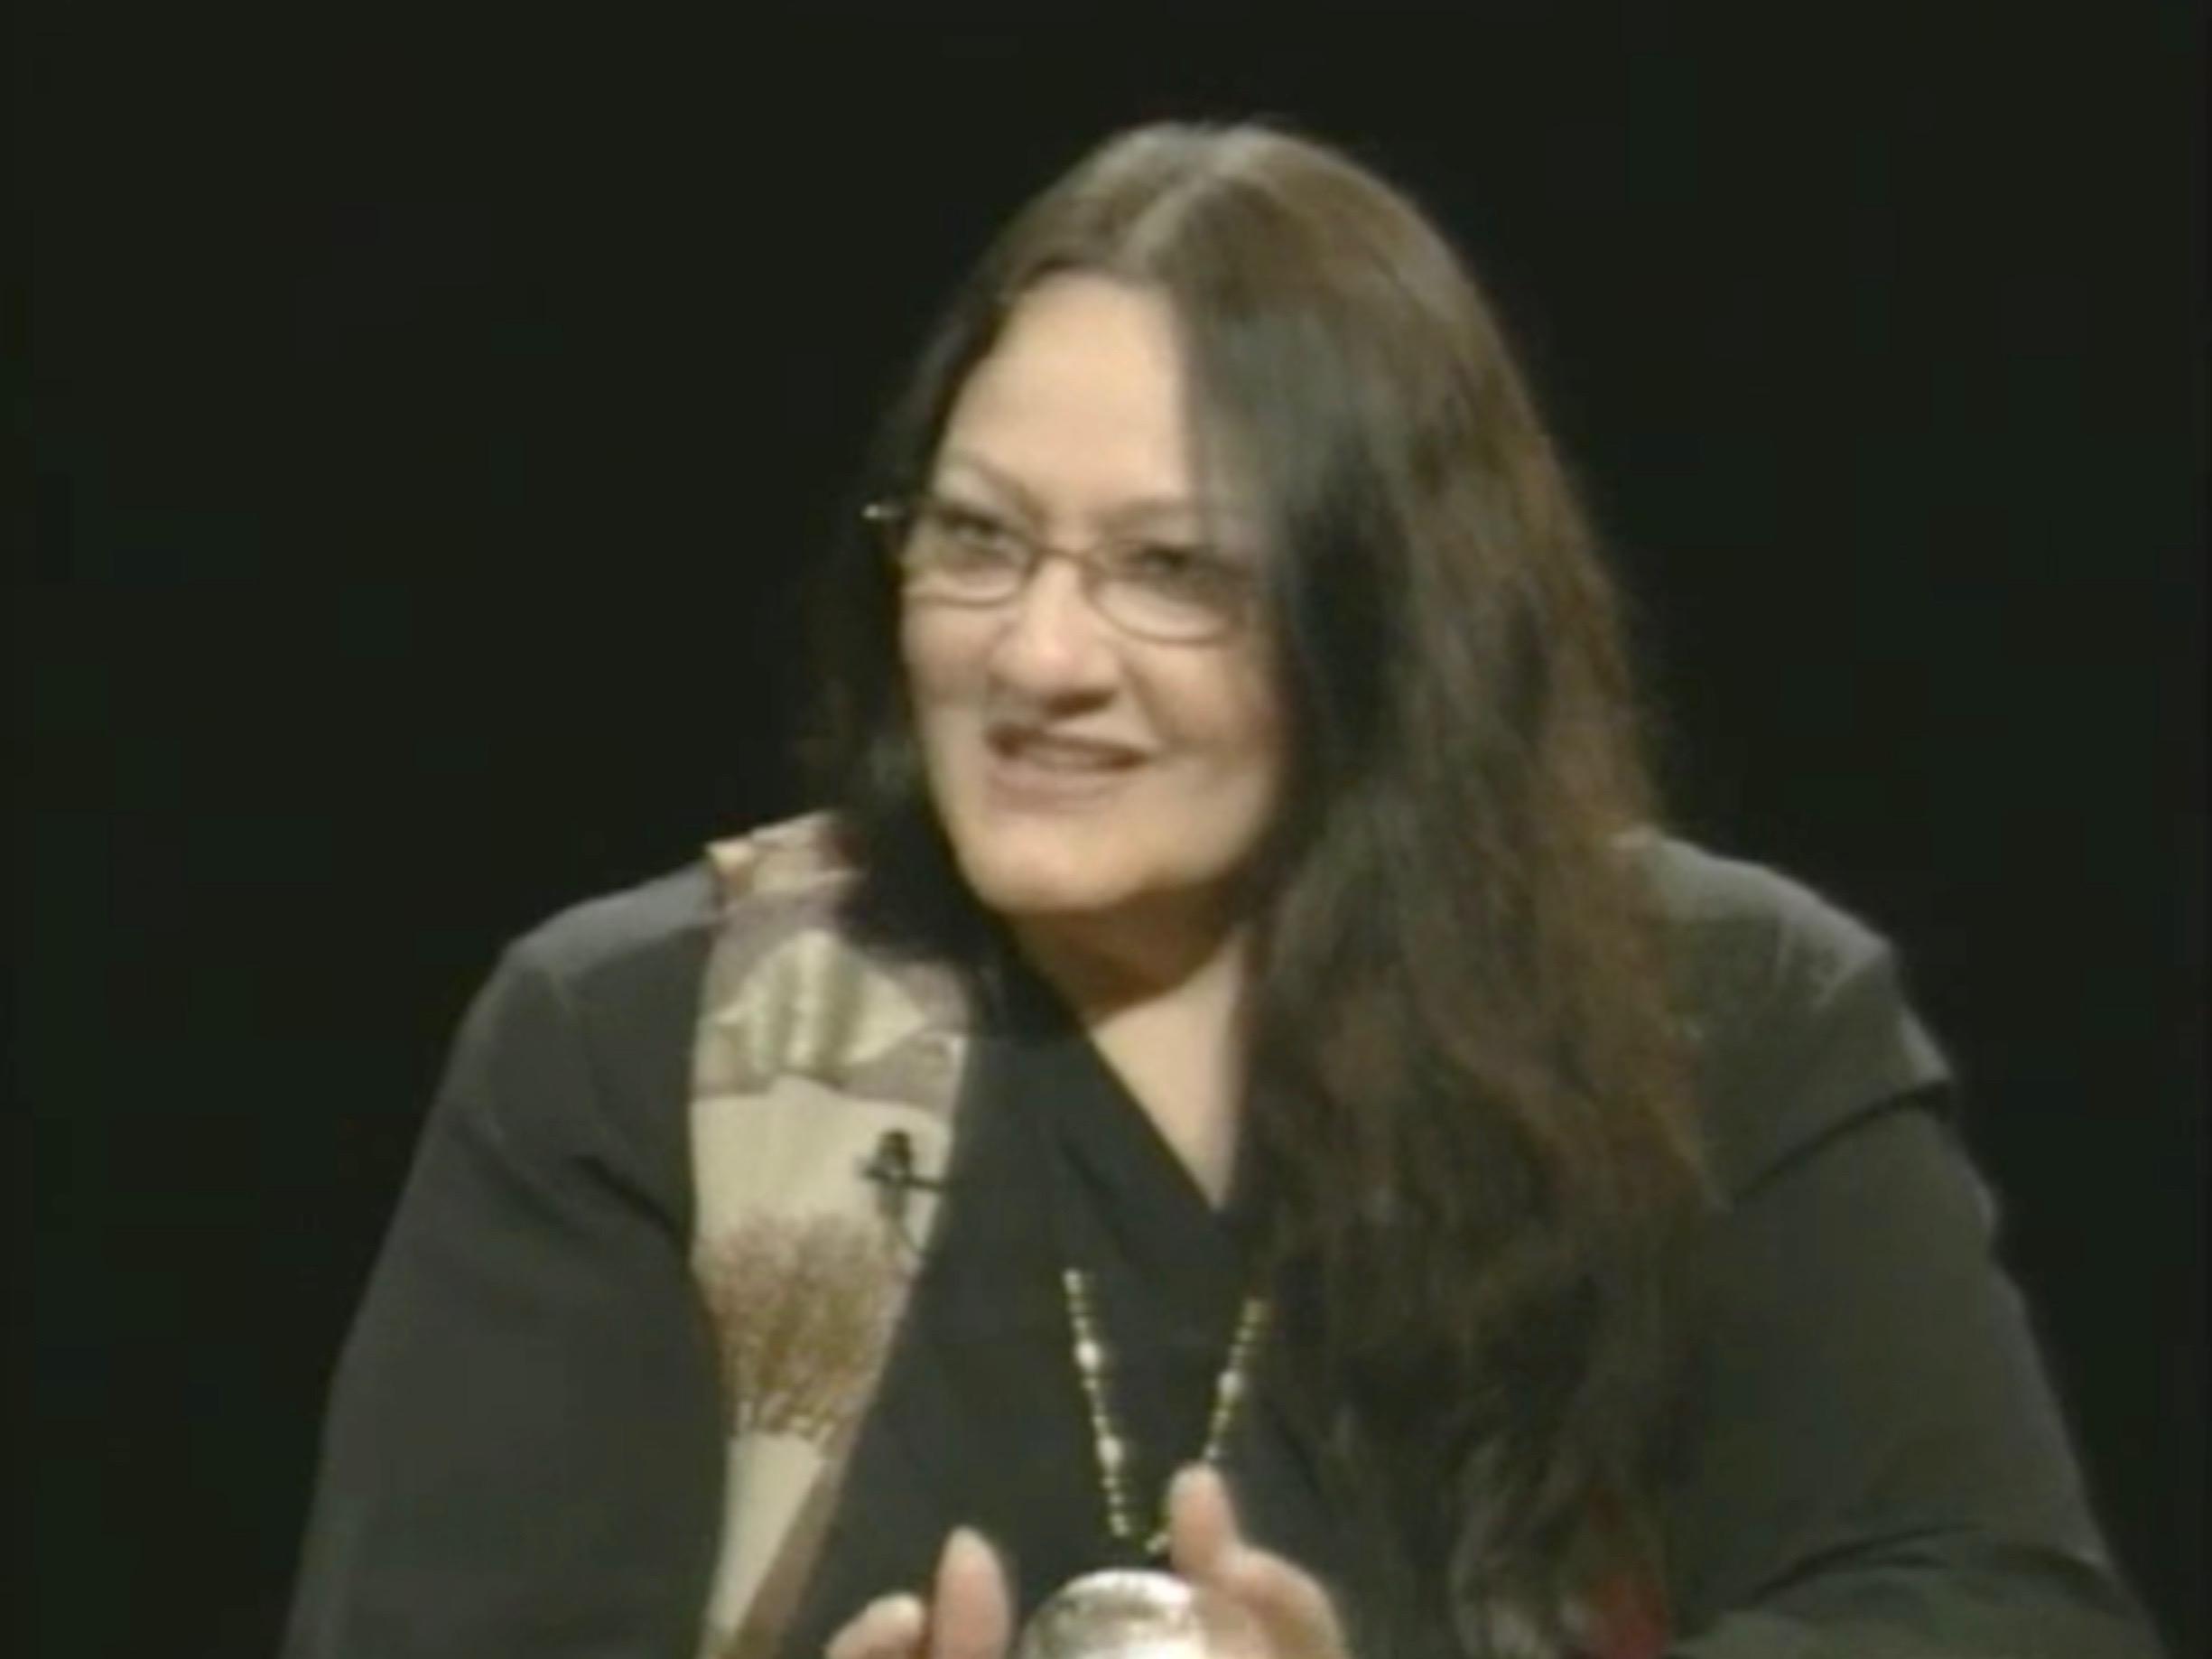 Activist Suzan Shown Harjo (Cheyenne, Hodulgee Muscogee) from Evening Exchange, WHUT (2001), https://americanarchive.org/catalog/cpb-aacip-293-ft8df6kg2n.